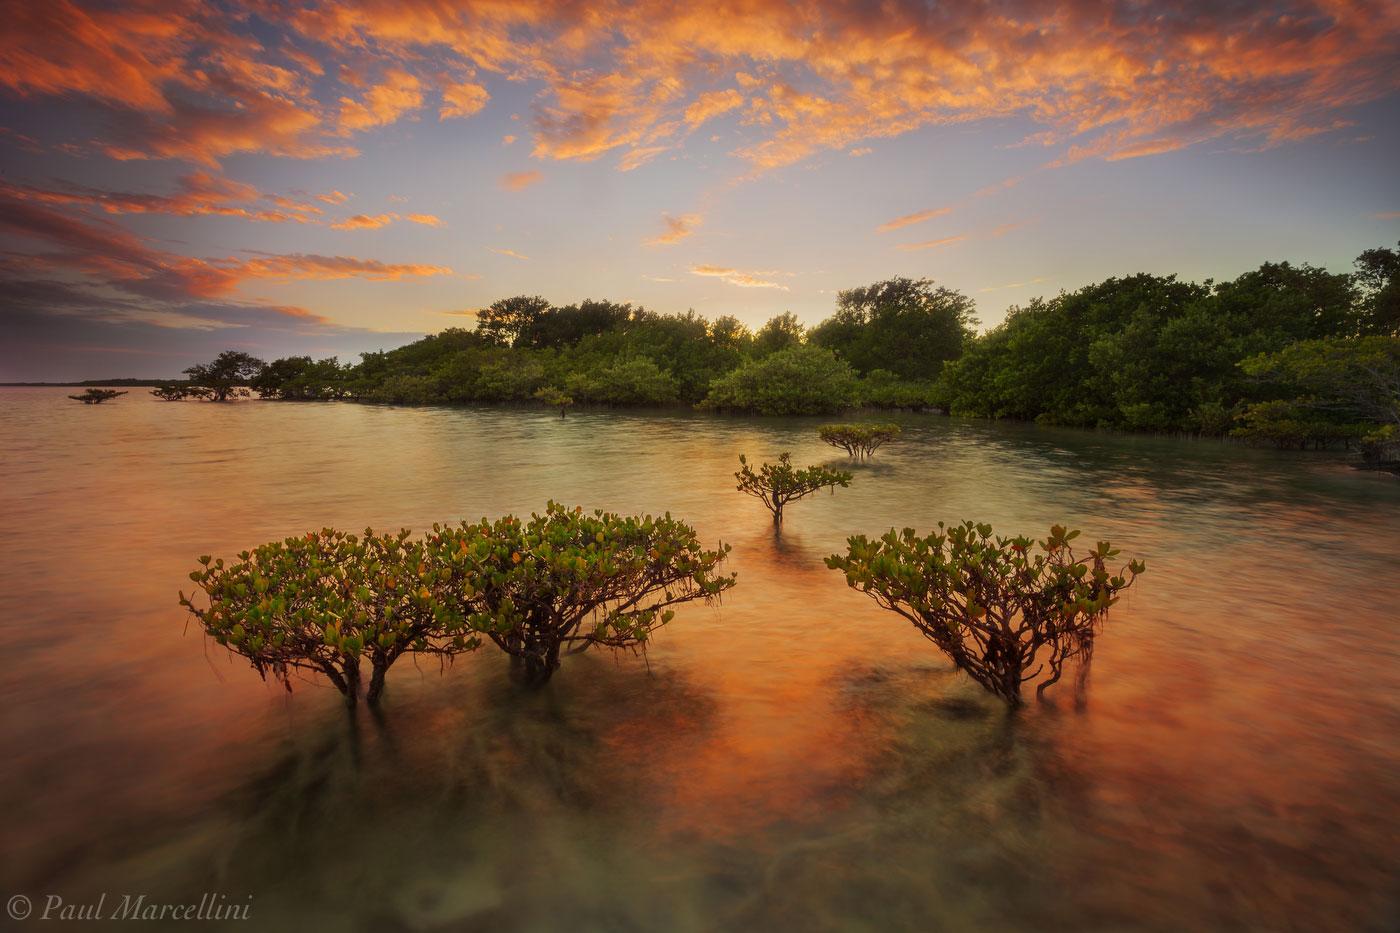 biscayne national park, mangroves, sunset, florida, nature, photography, photo